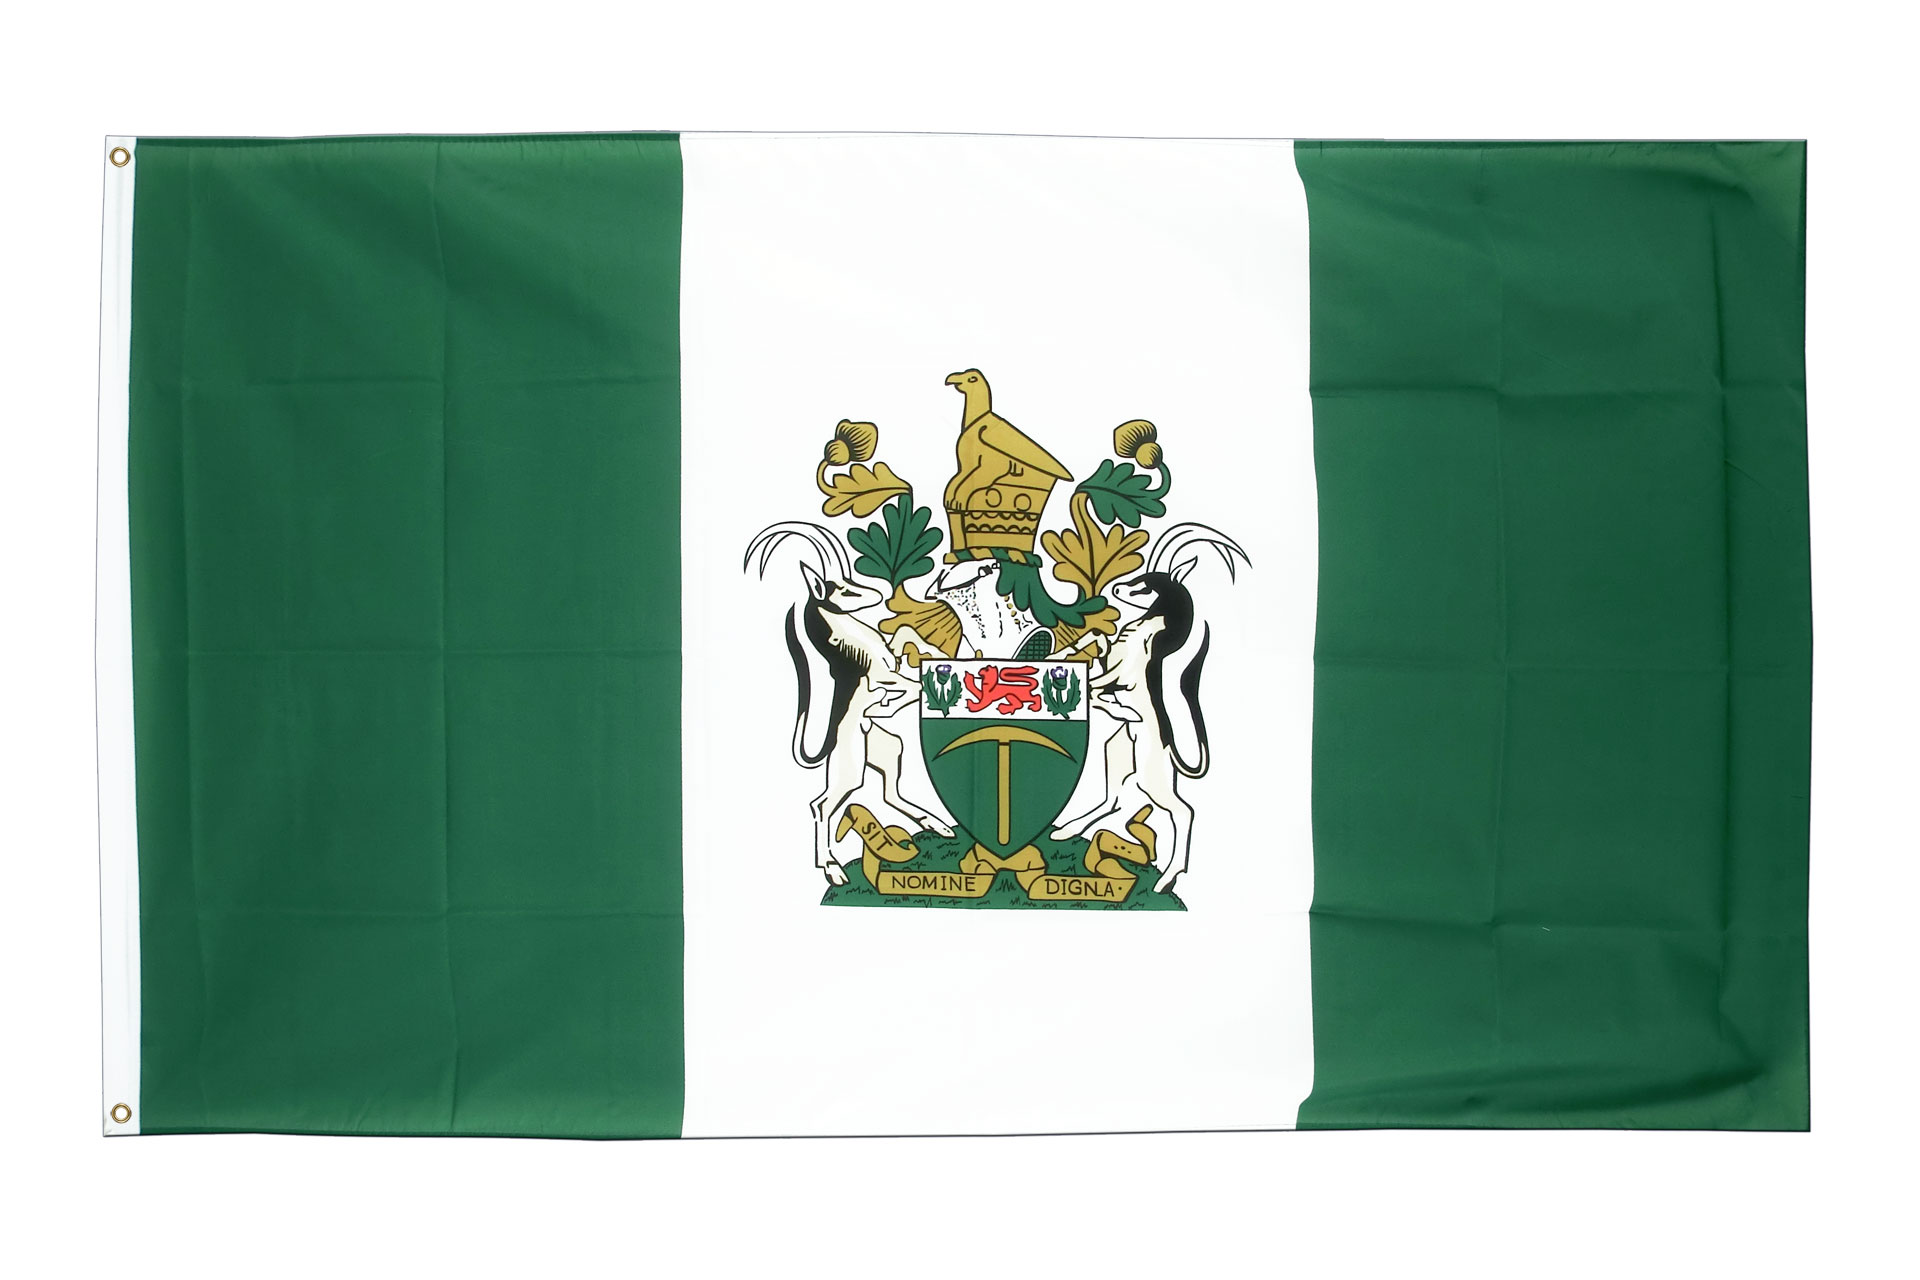 Buy Rhodesia Flag - 3x5 ft (90x150 cm) - Royal-Flags: https://www.royal-flags.co.uk/rhodesia-flag-1970.html